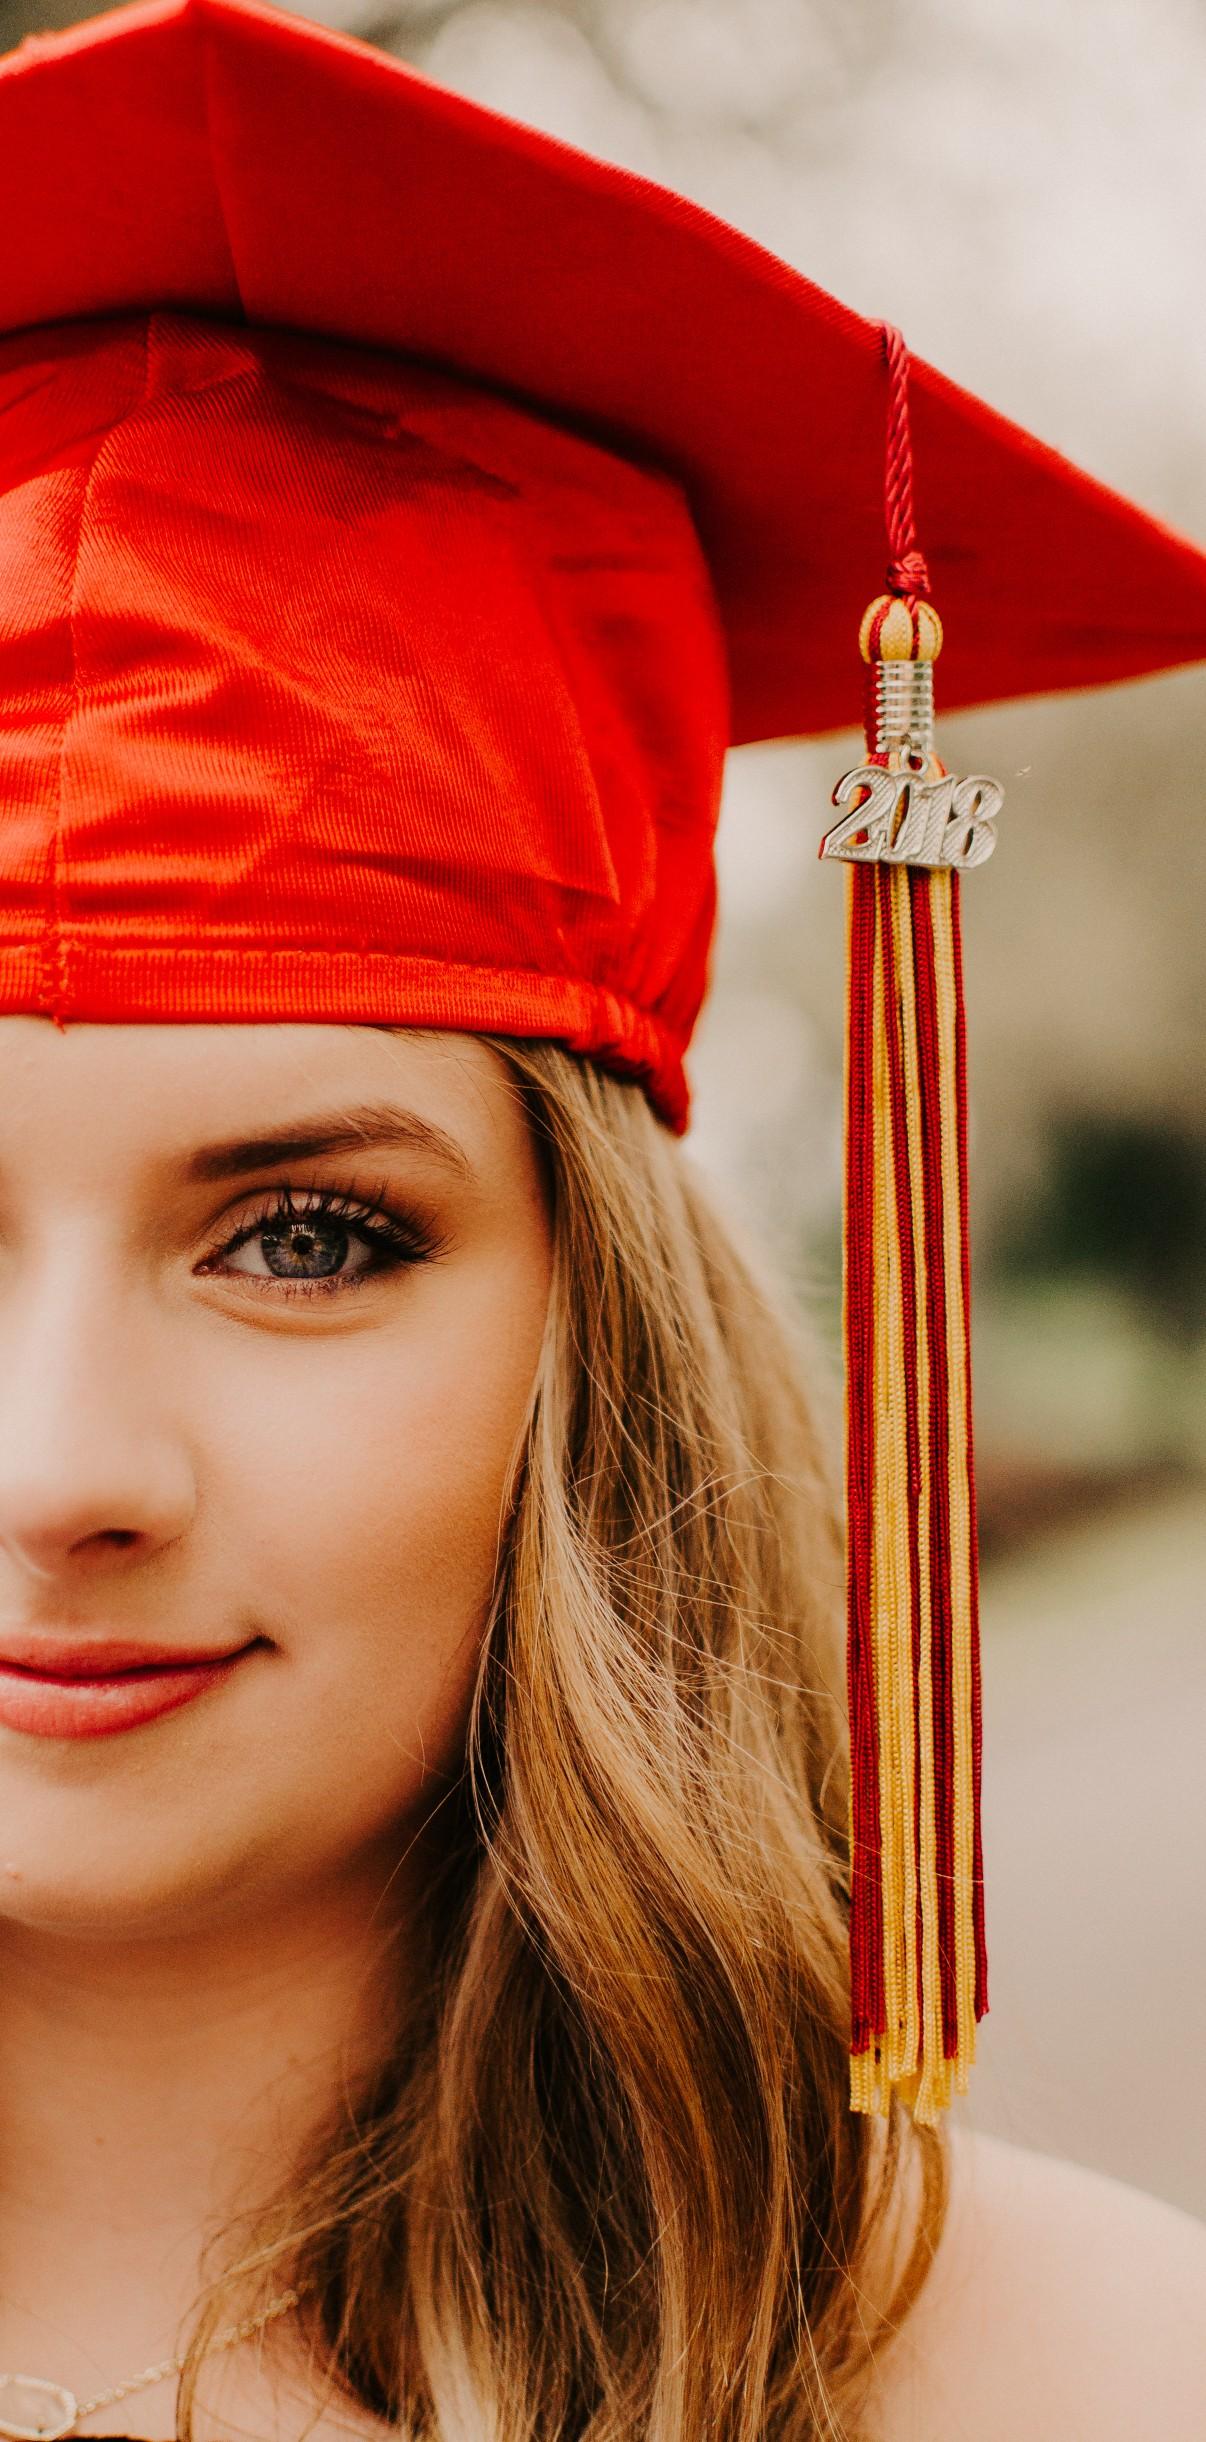 highschool-senior-portrait.jpg.